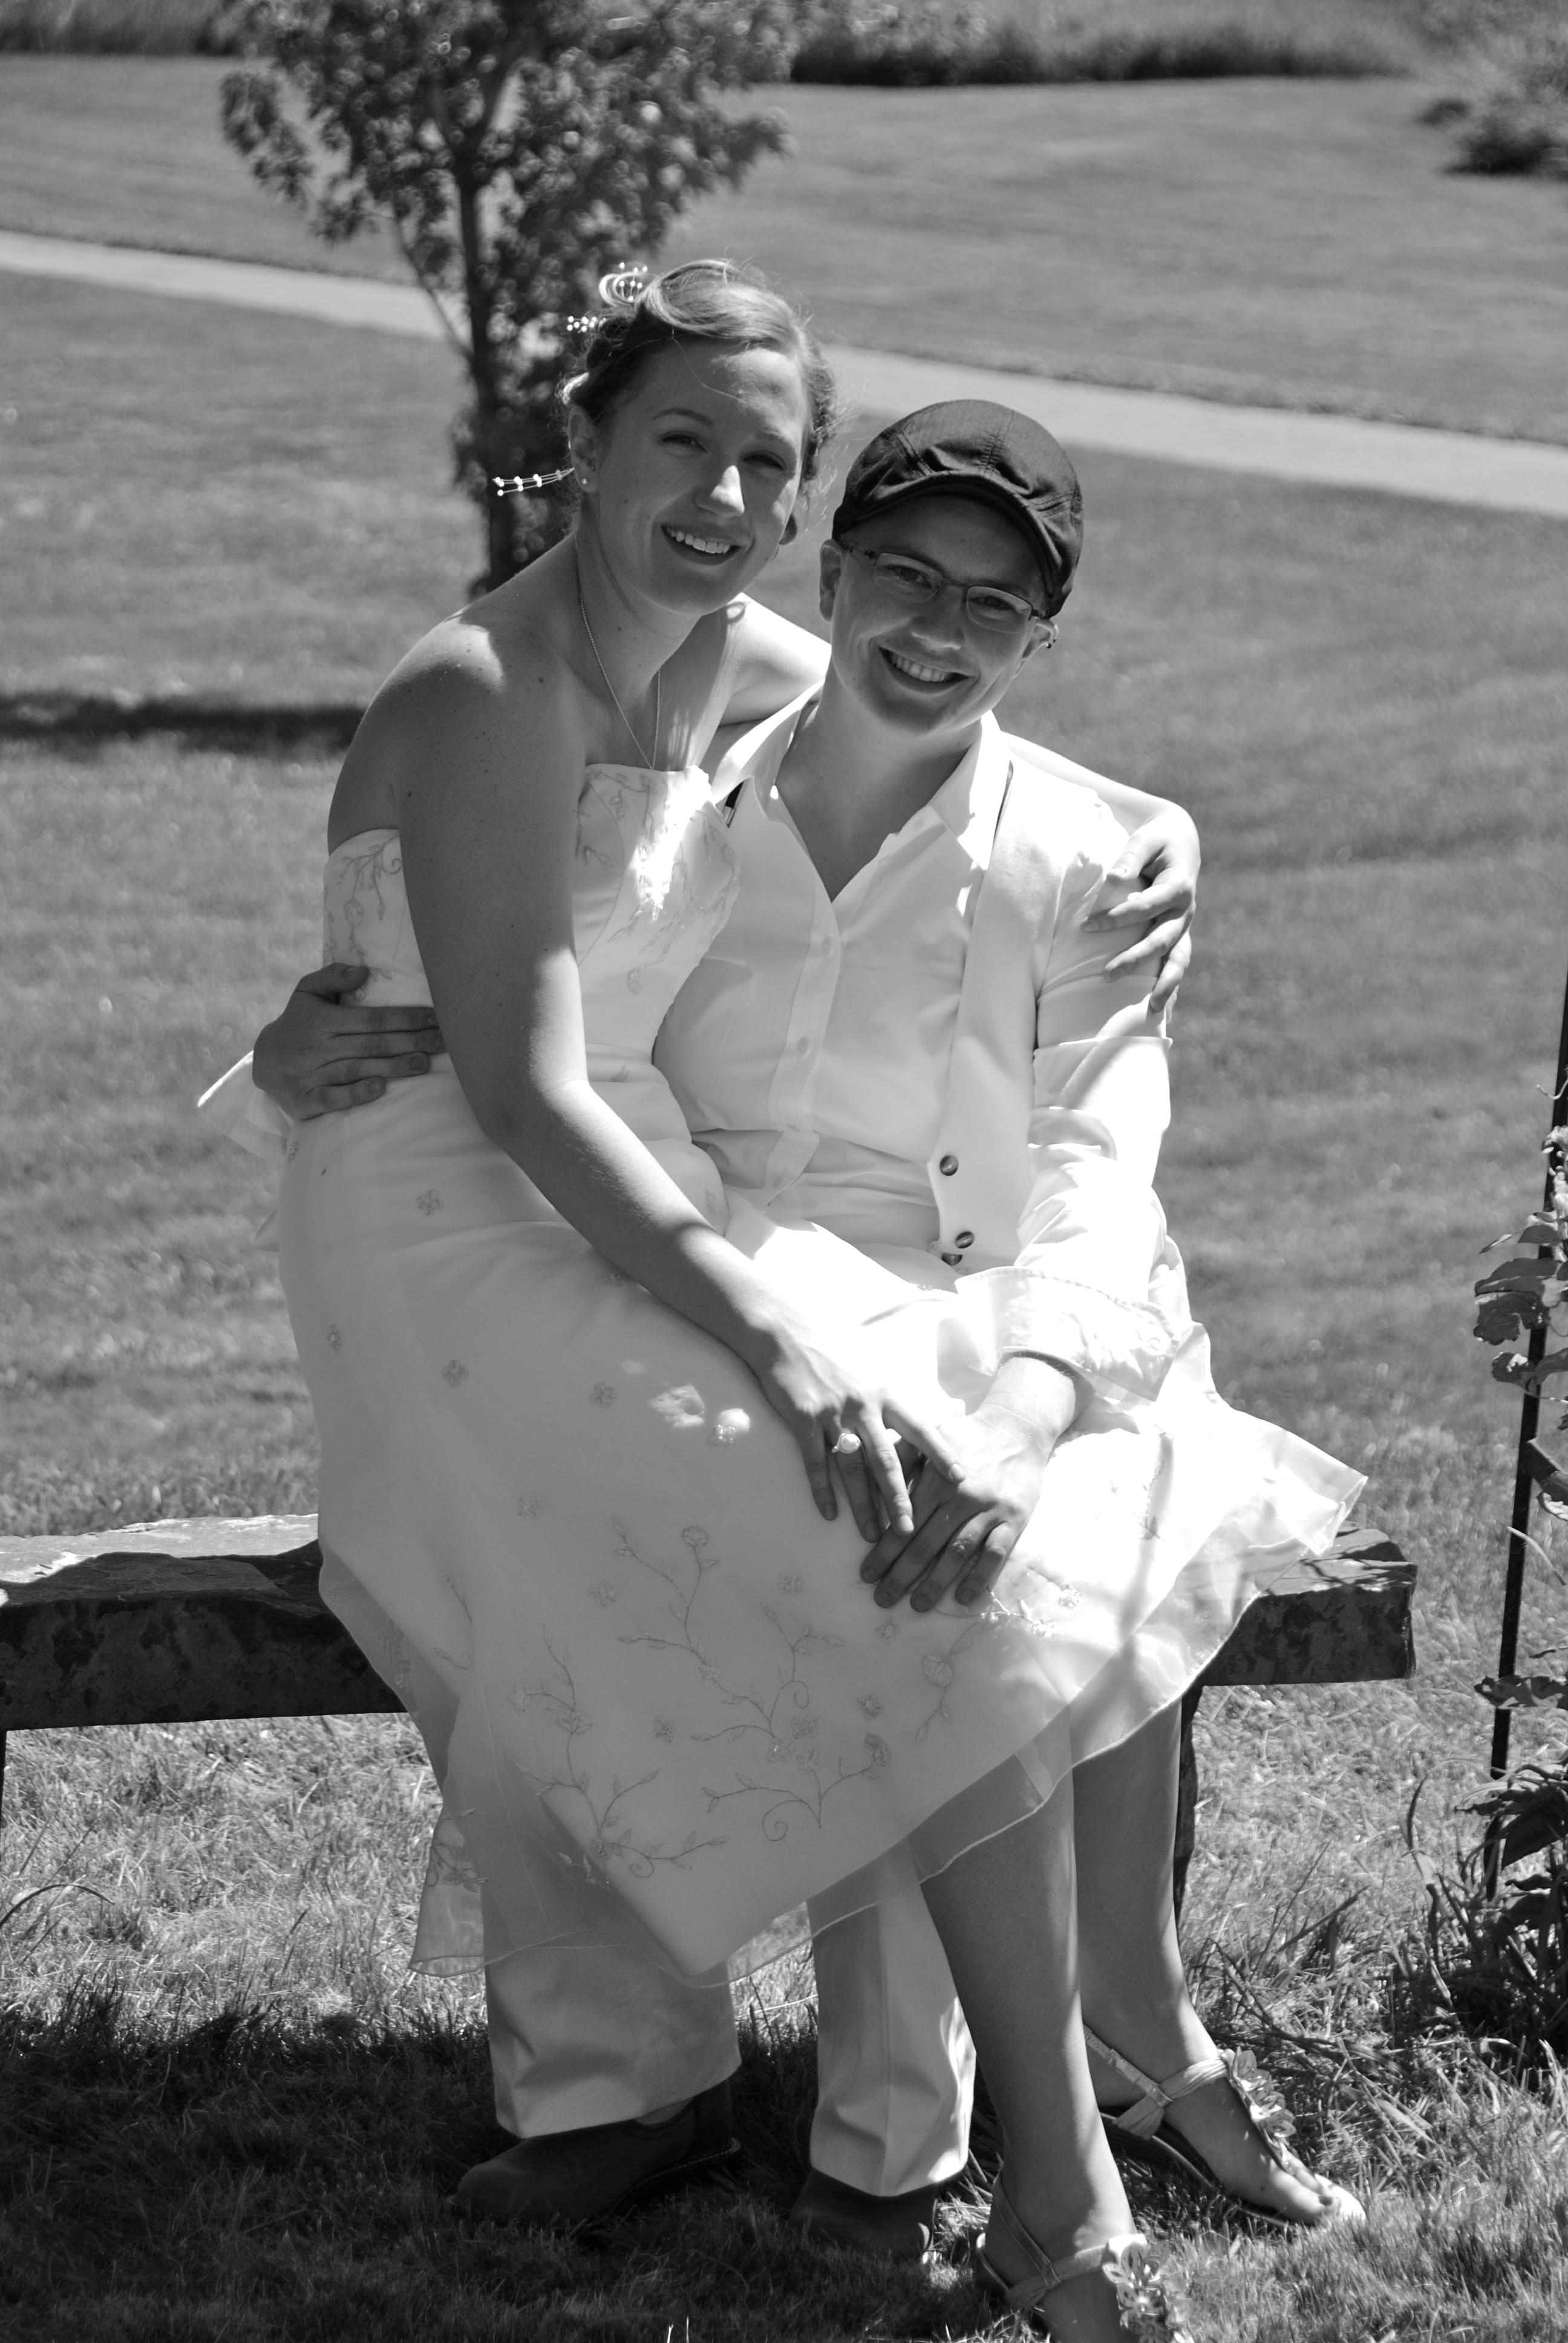 dsc lesbian wedding ideas Jewish Backyard Lesbian Wedding 11 A Practical Wedding We re Your Wedding Planner Wedding Ideas for Brides Bridesmaids Grooms and More A Practical